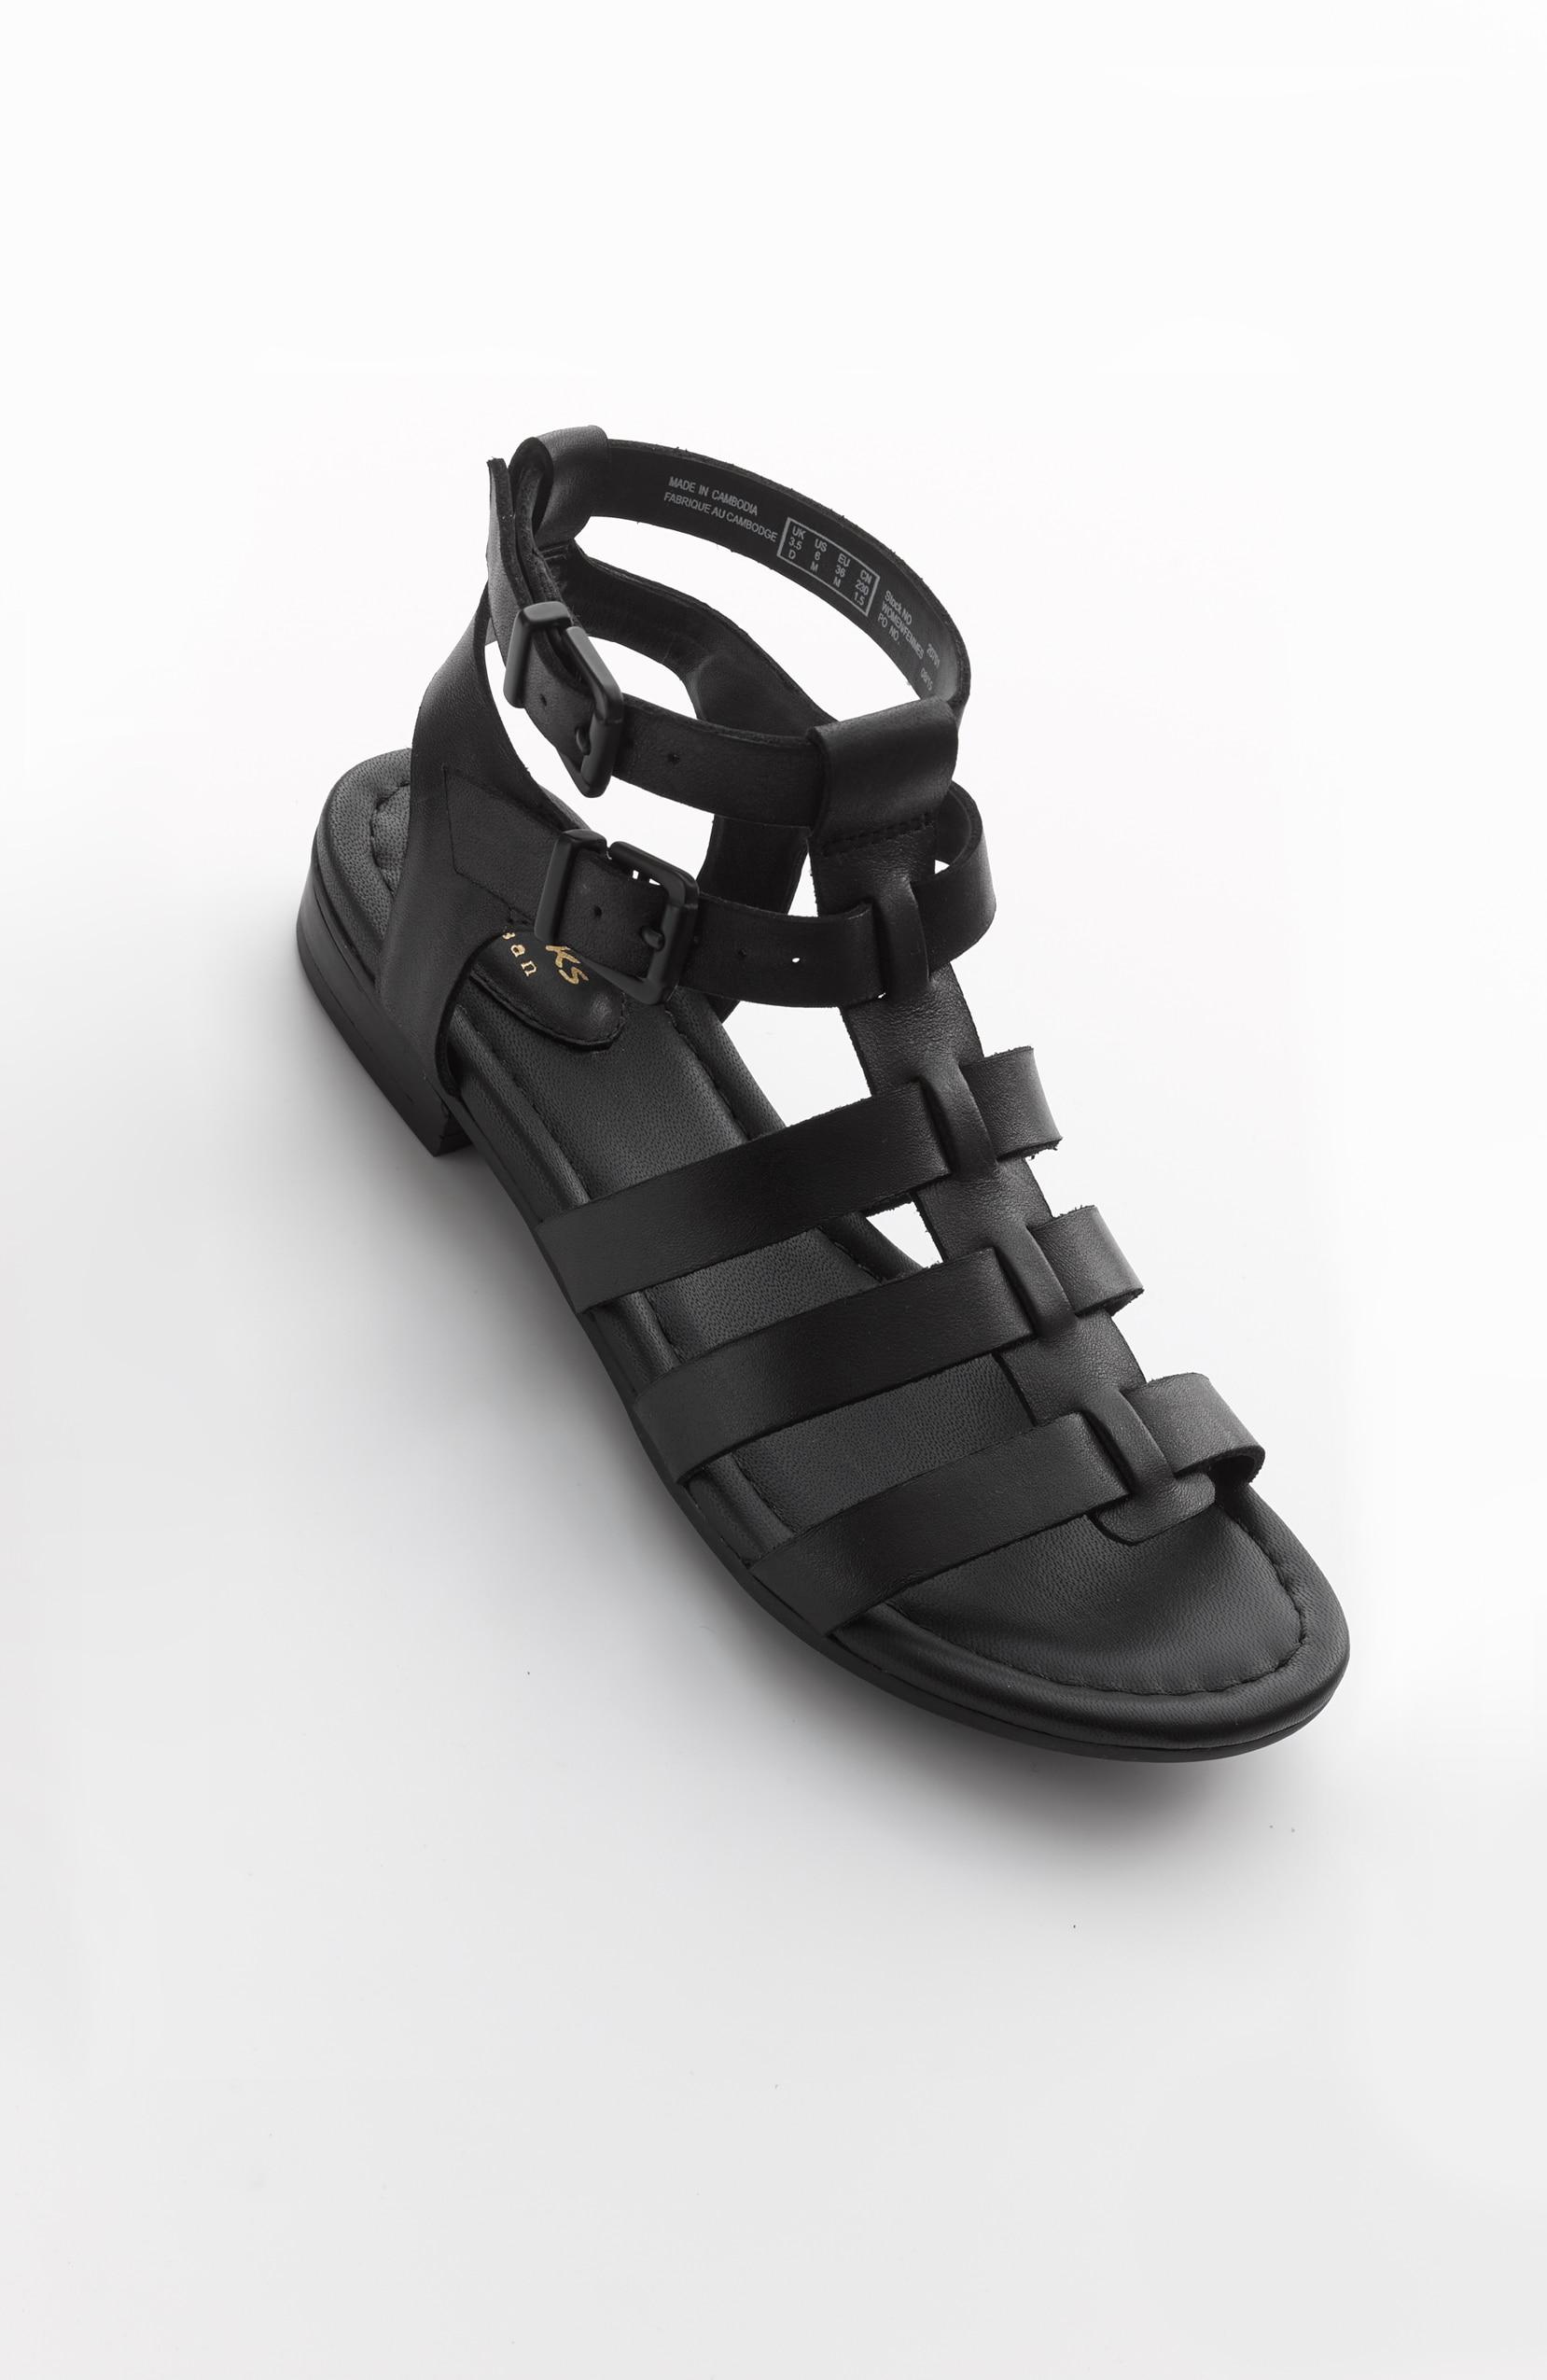 Clarks® Viveca Myth sandals